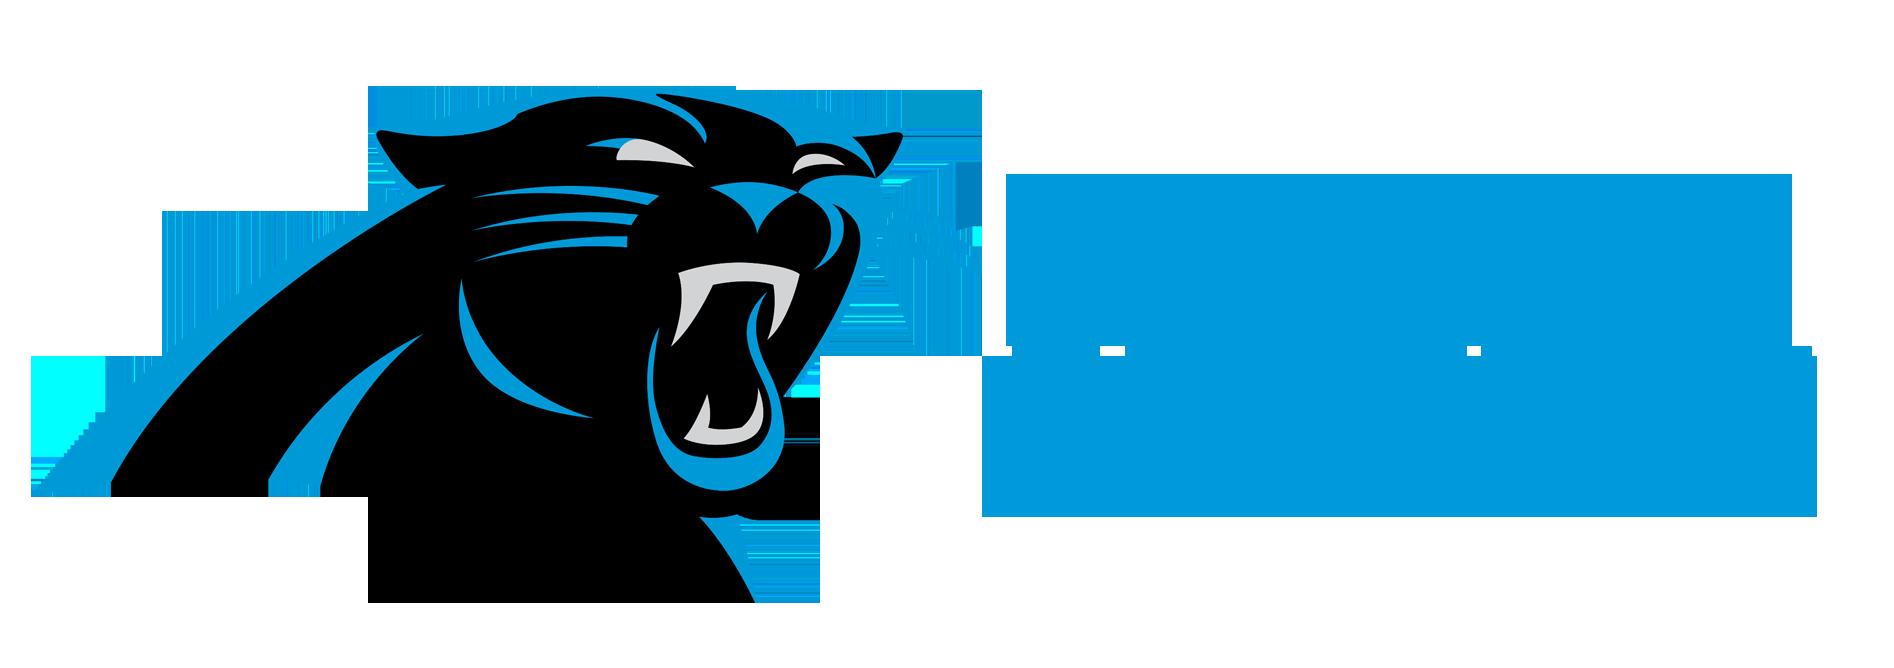 Carolina panthers clipart download Free Carolina Panthers Cliparts, Download Free Clip Art, Free Clip ... download